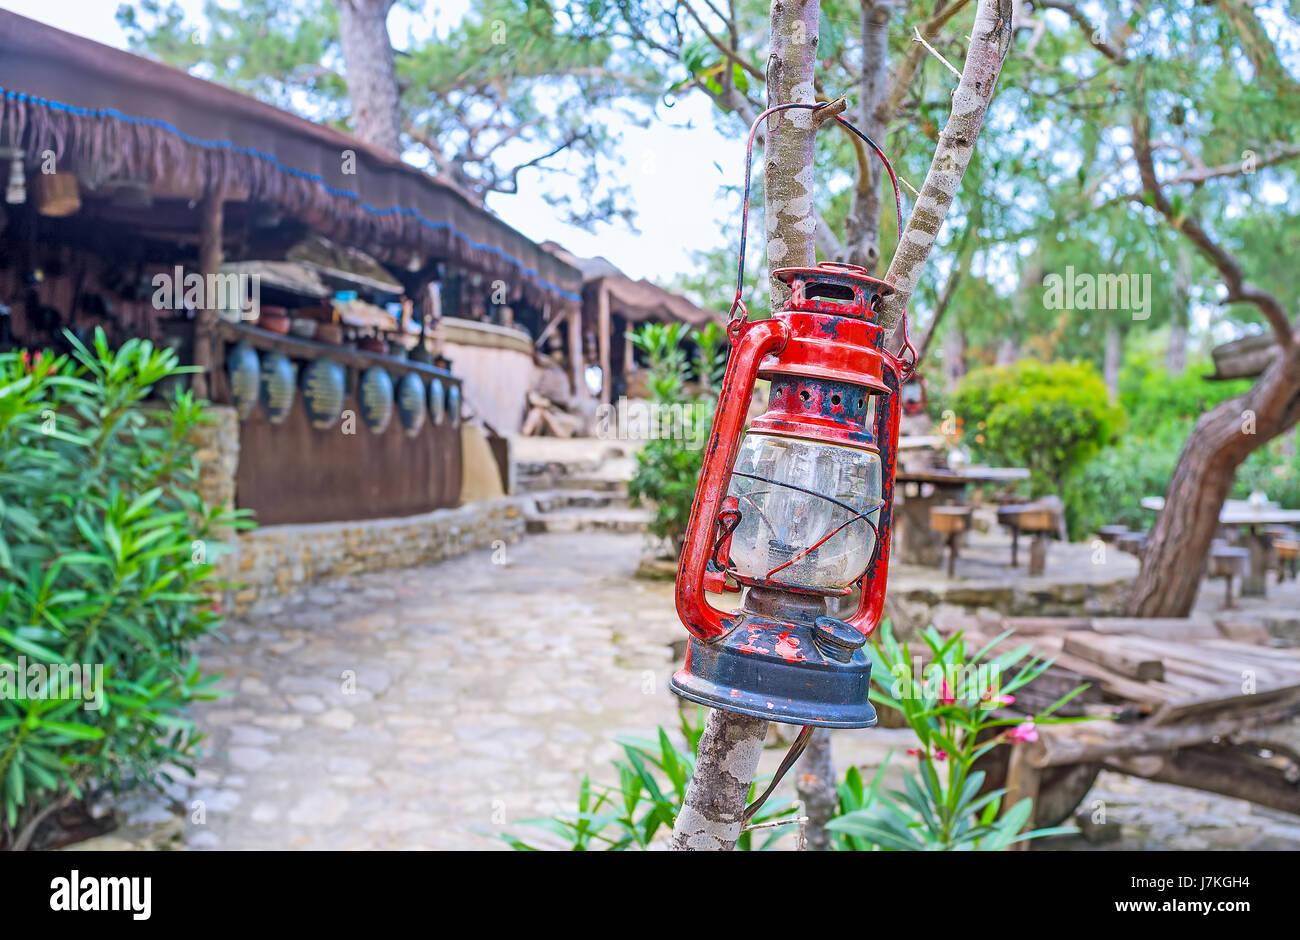 The vintage kerosene lamp decorates the rustic outdoor cafe in Yoruk park, Kemer, Turkey. - Stock Image